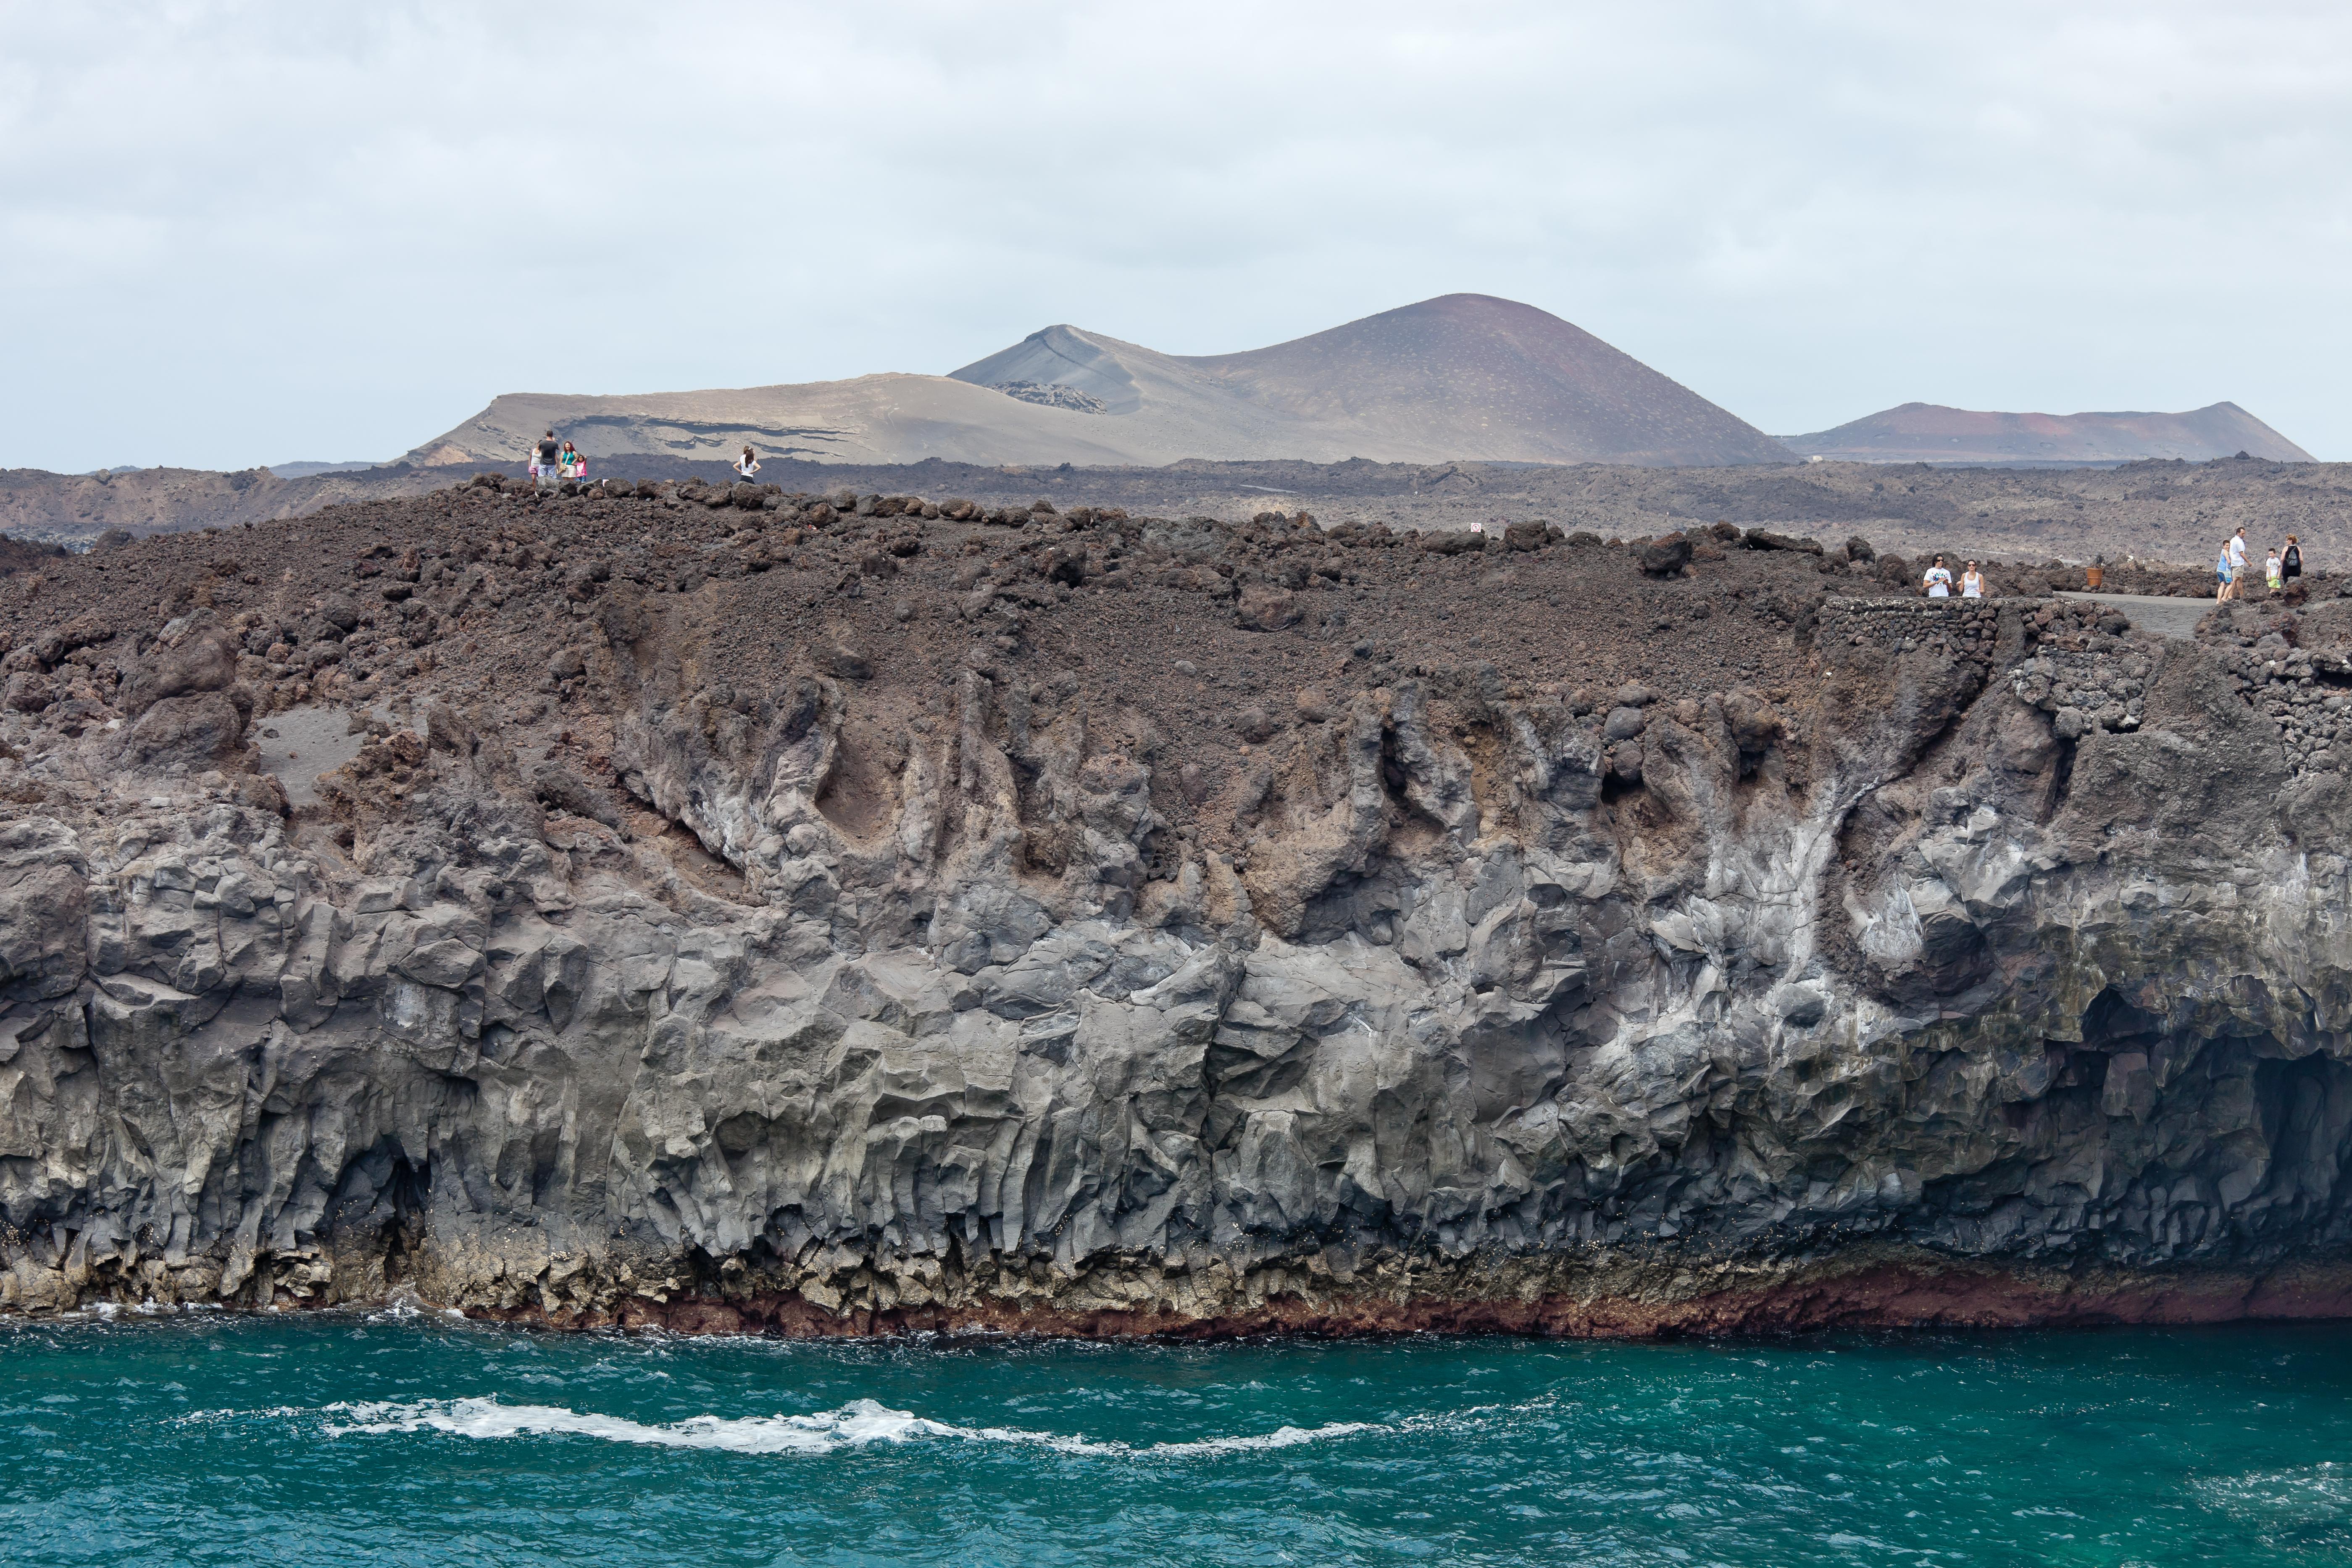 File:Los Hervideros - Lanzarote - LH04.jpg - Wikimedia Commons